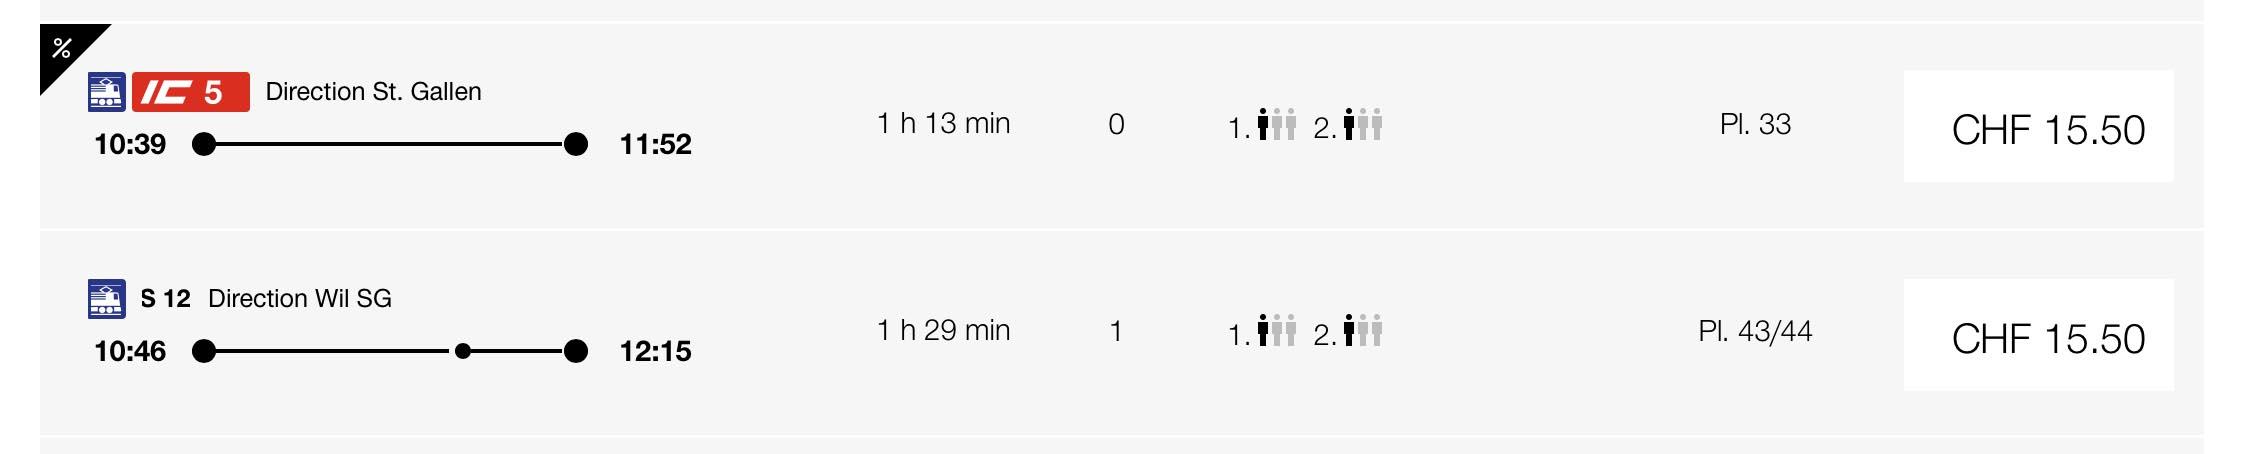 opções de trem de Zurich para st gallen